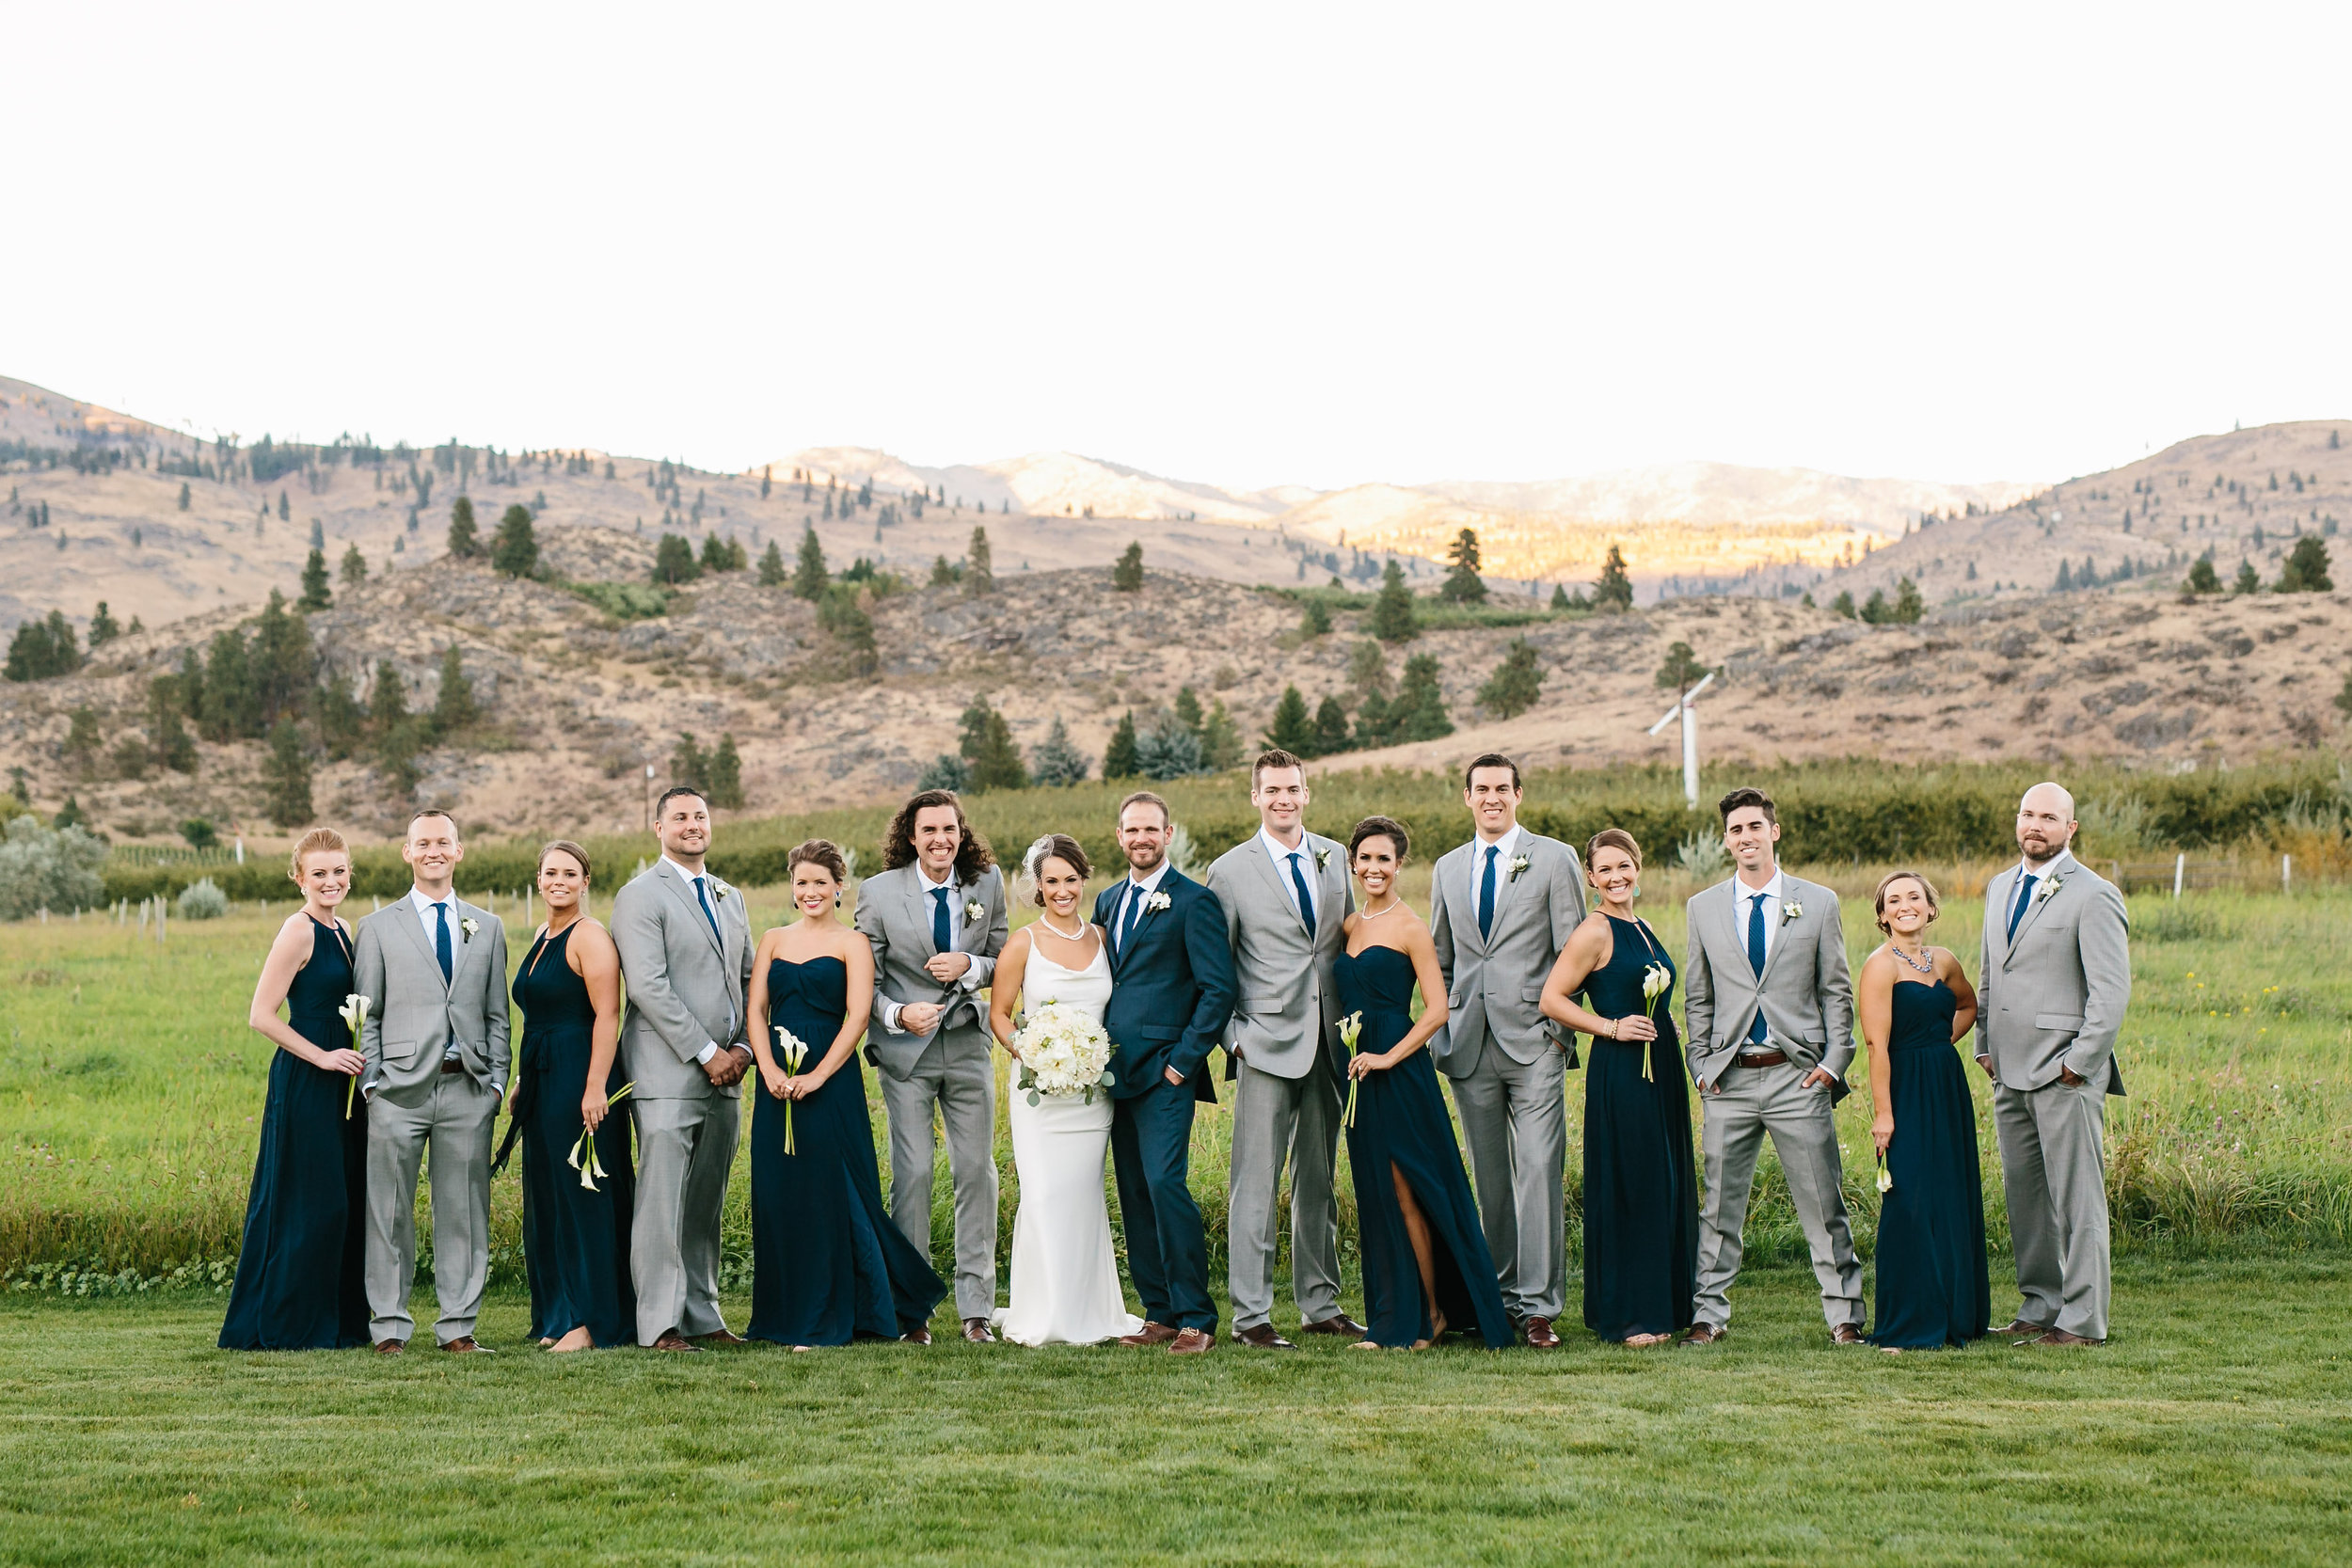 janet_greg_wedding-1077.jpg